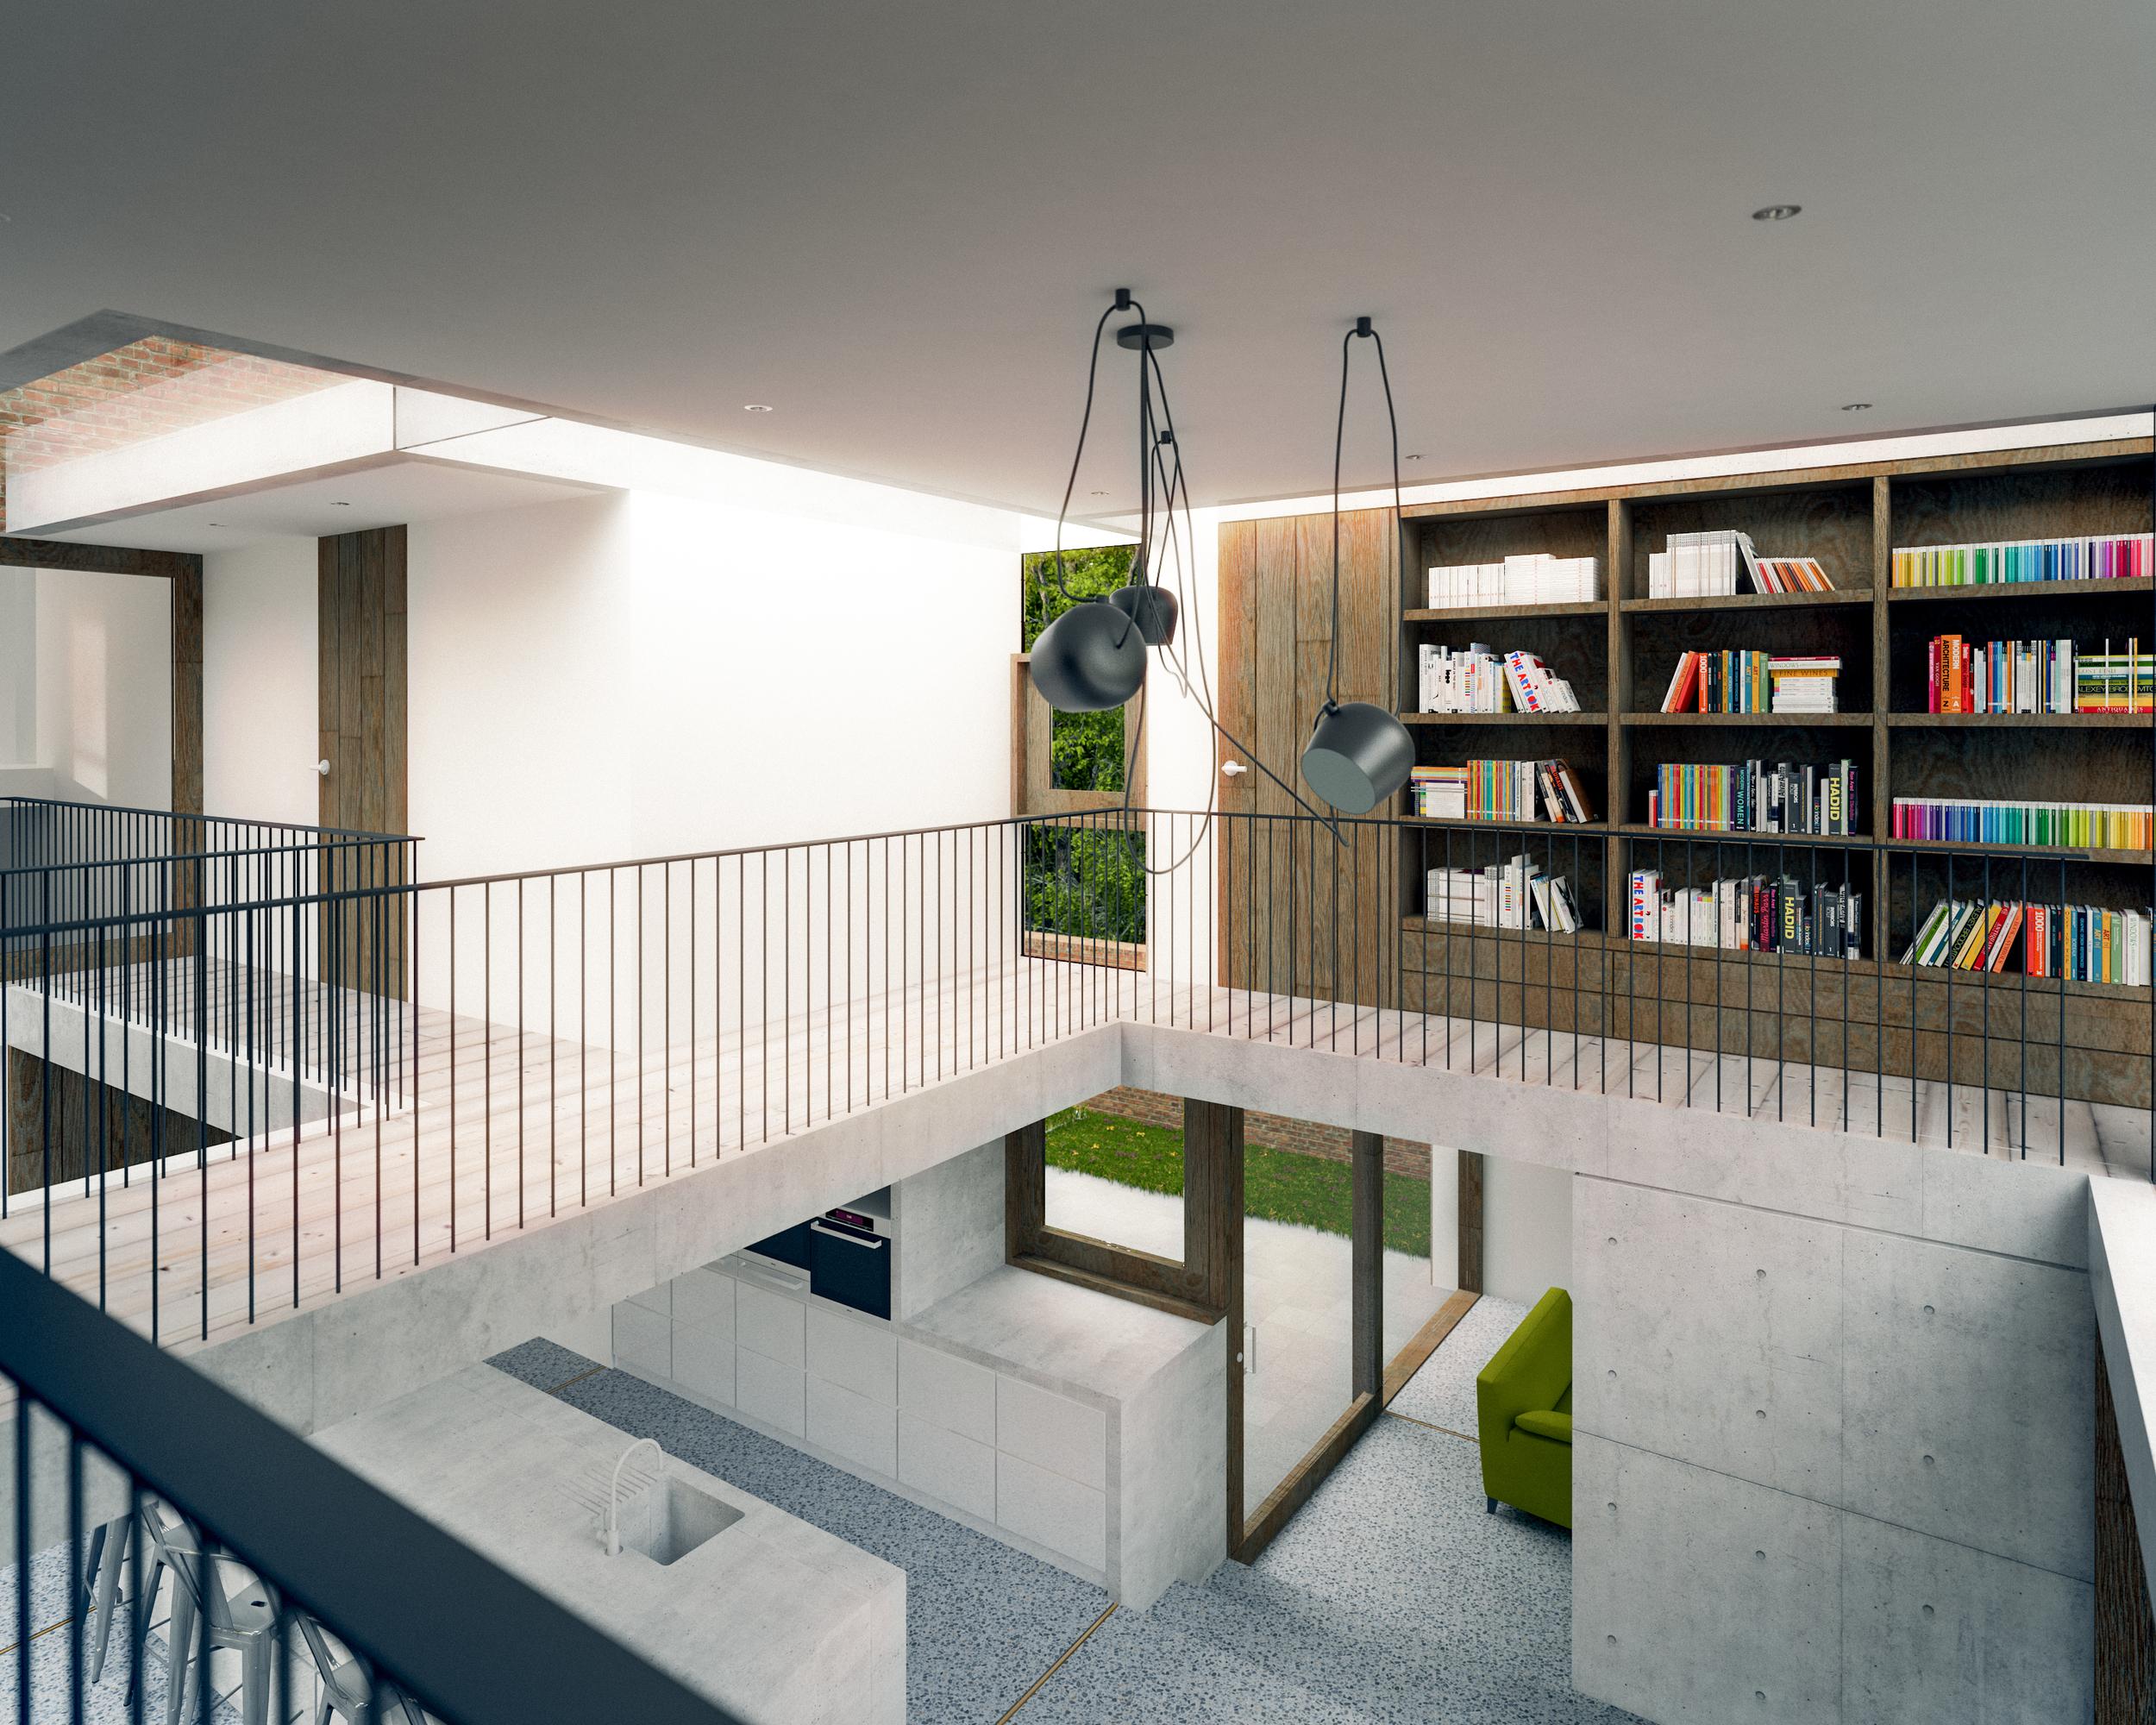 internal view of first floor